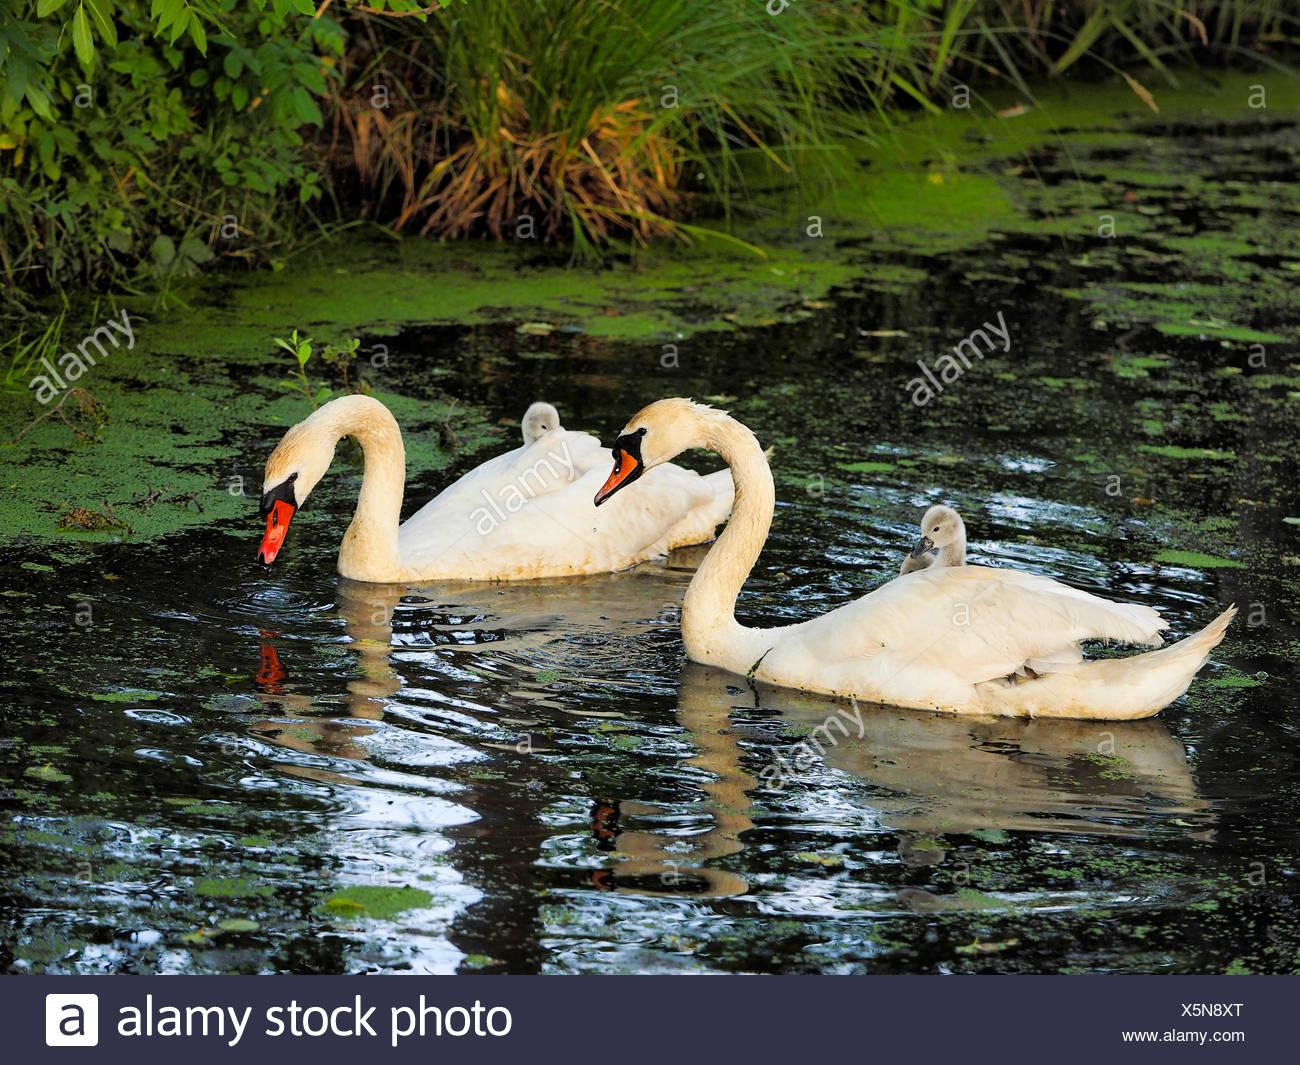 mute swan (Cygnus olor), mute swans with chicks, Germany, Saxony Stock Photo